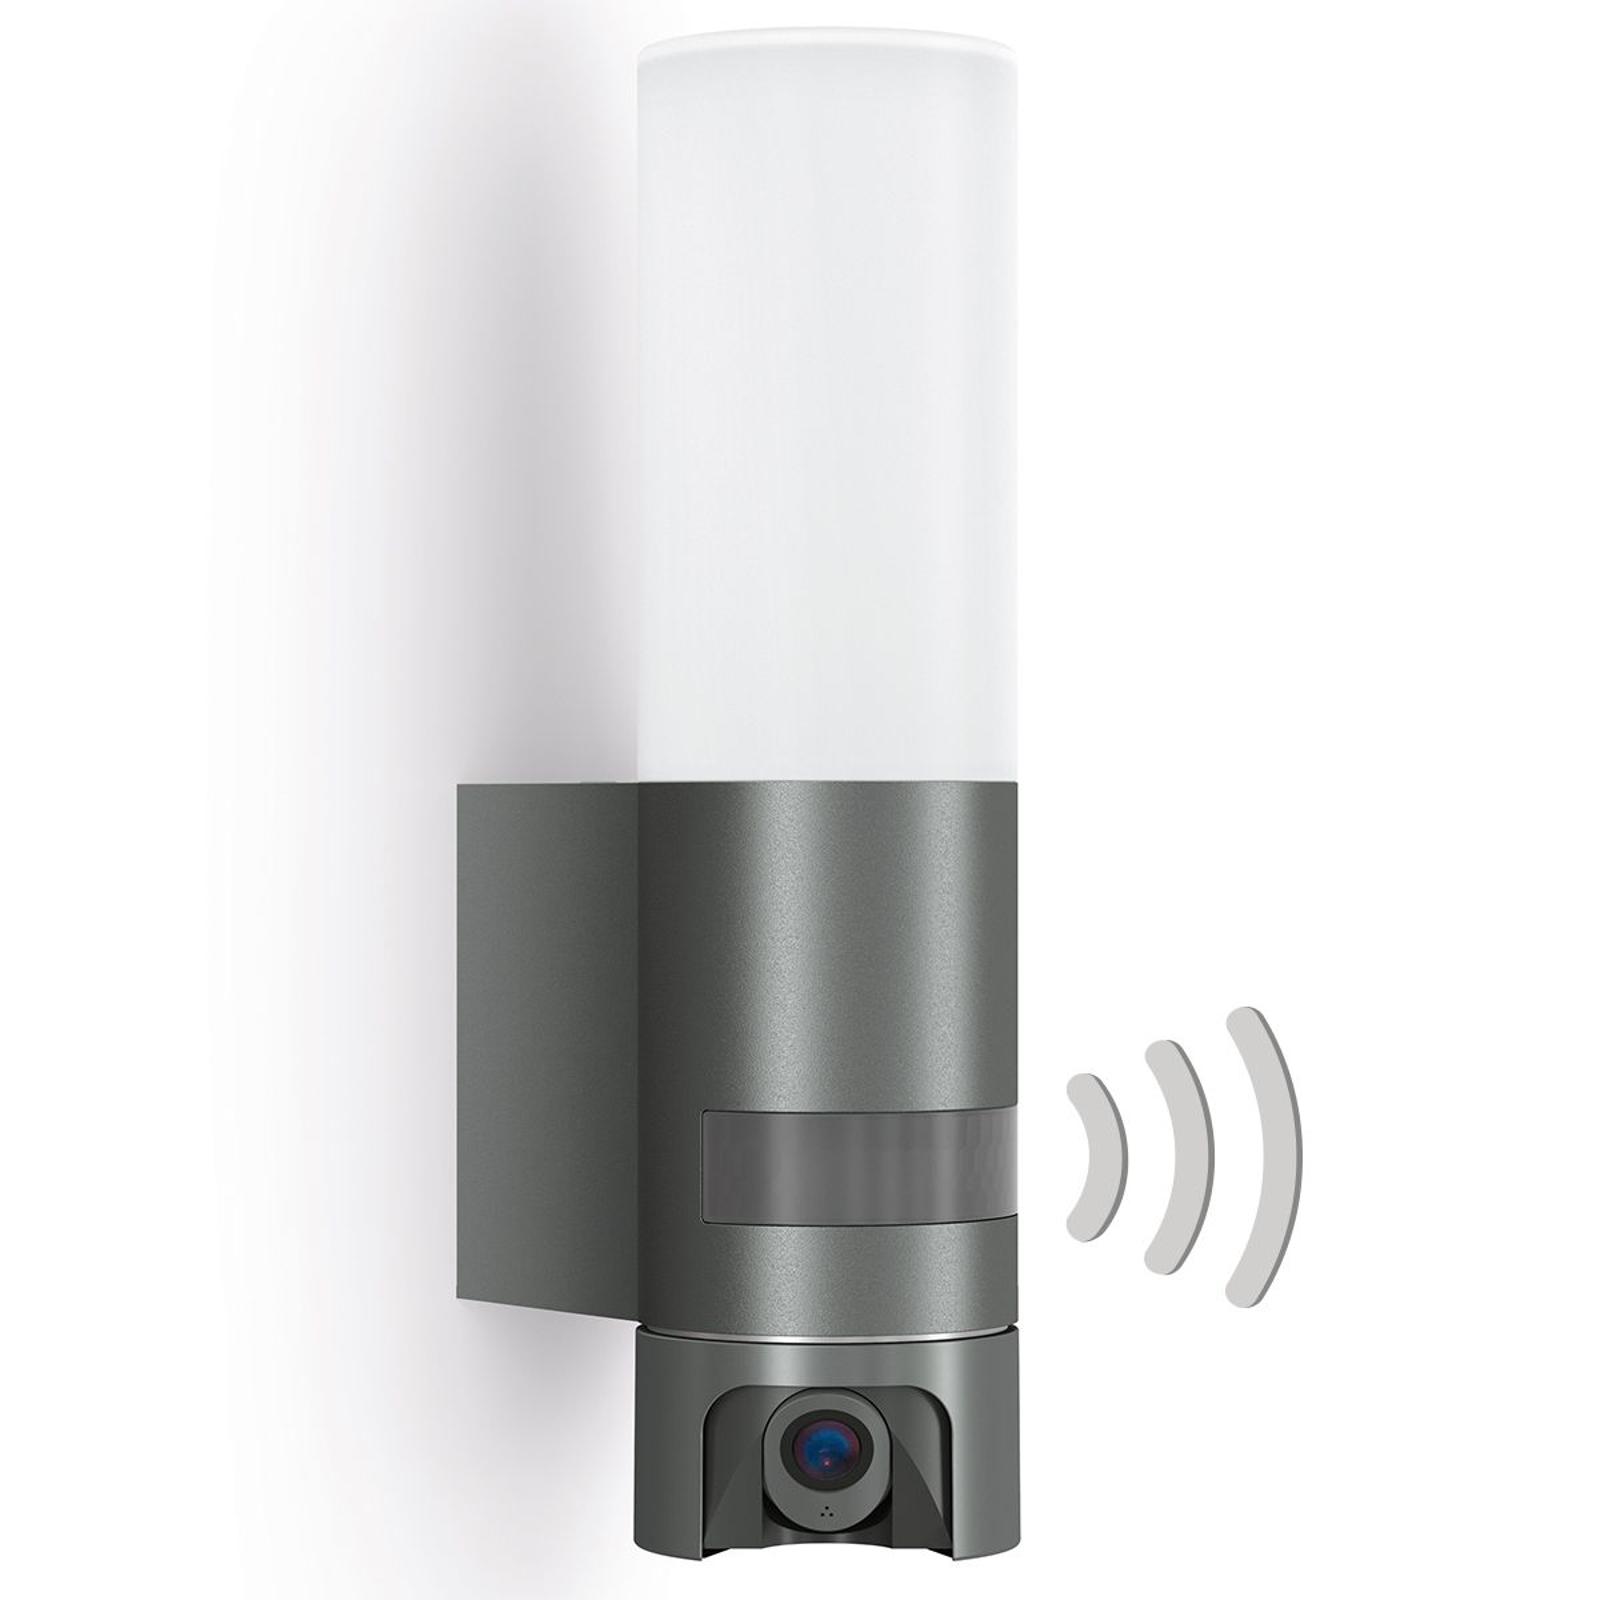 L 620 Cam -LED-ulkoseinälamppu tunnistimella